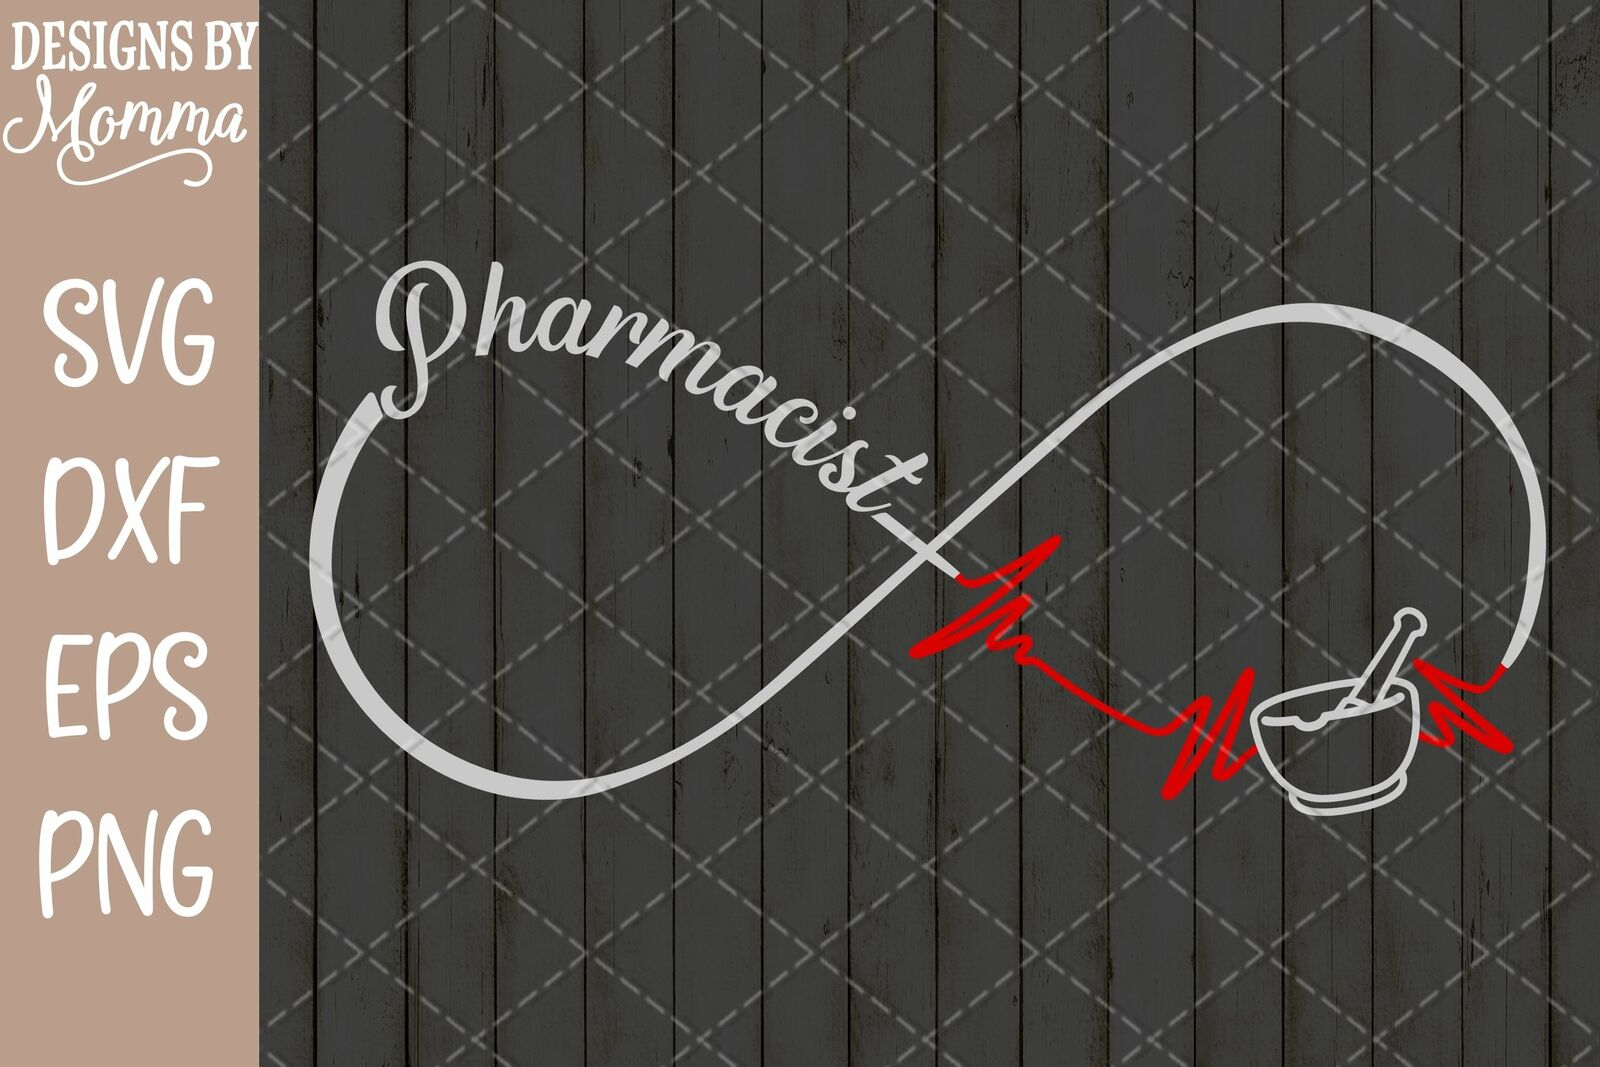 Pharmacist Pharmacy Infinity Svg Dxf Eps Png Cut File Cricut Silhouette For Sale Online Ebay